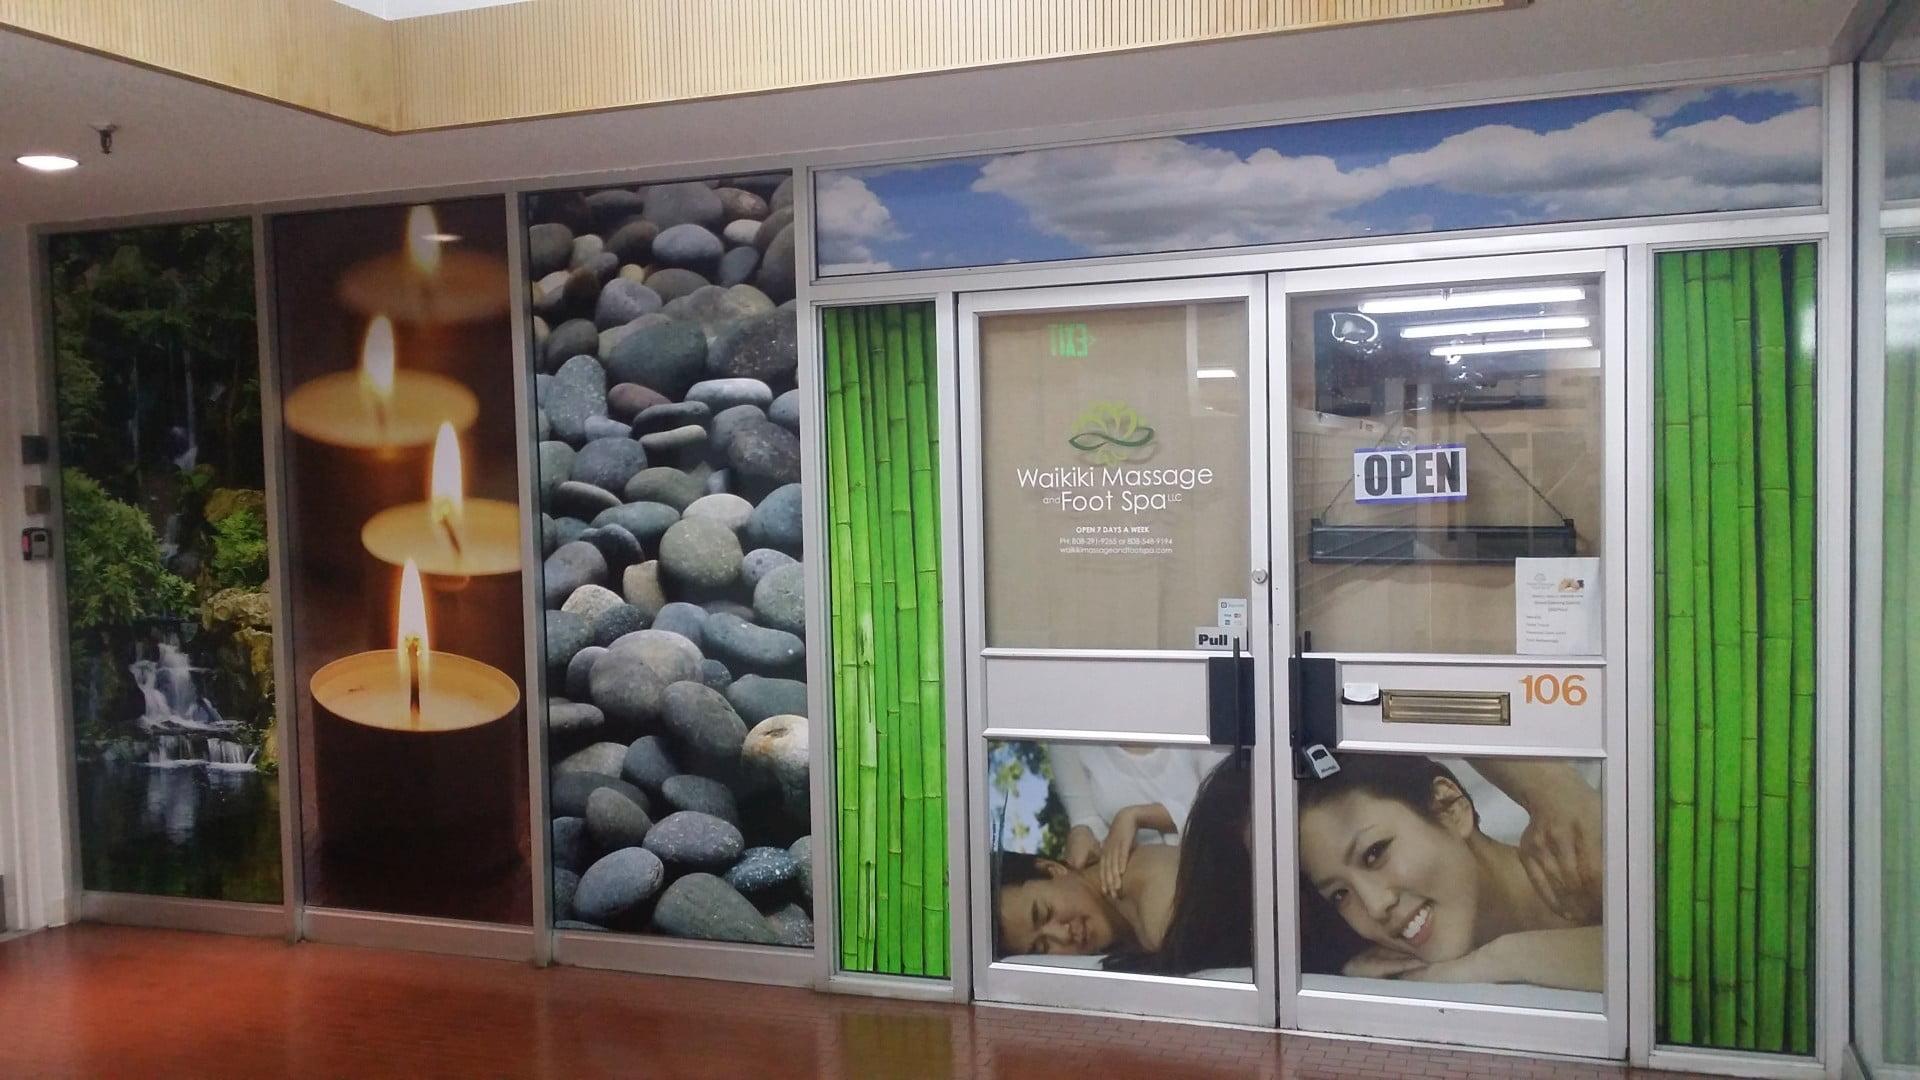 Waikiki Massage and Foot Spa LLC